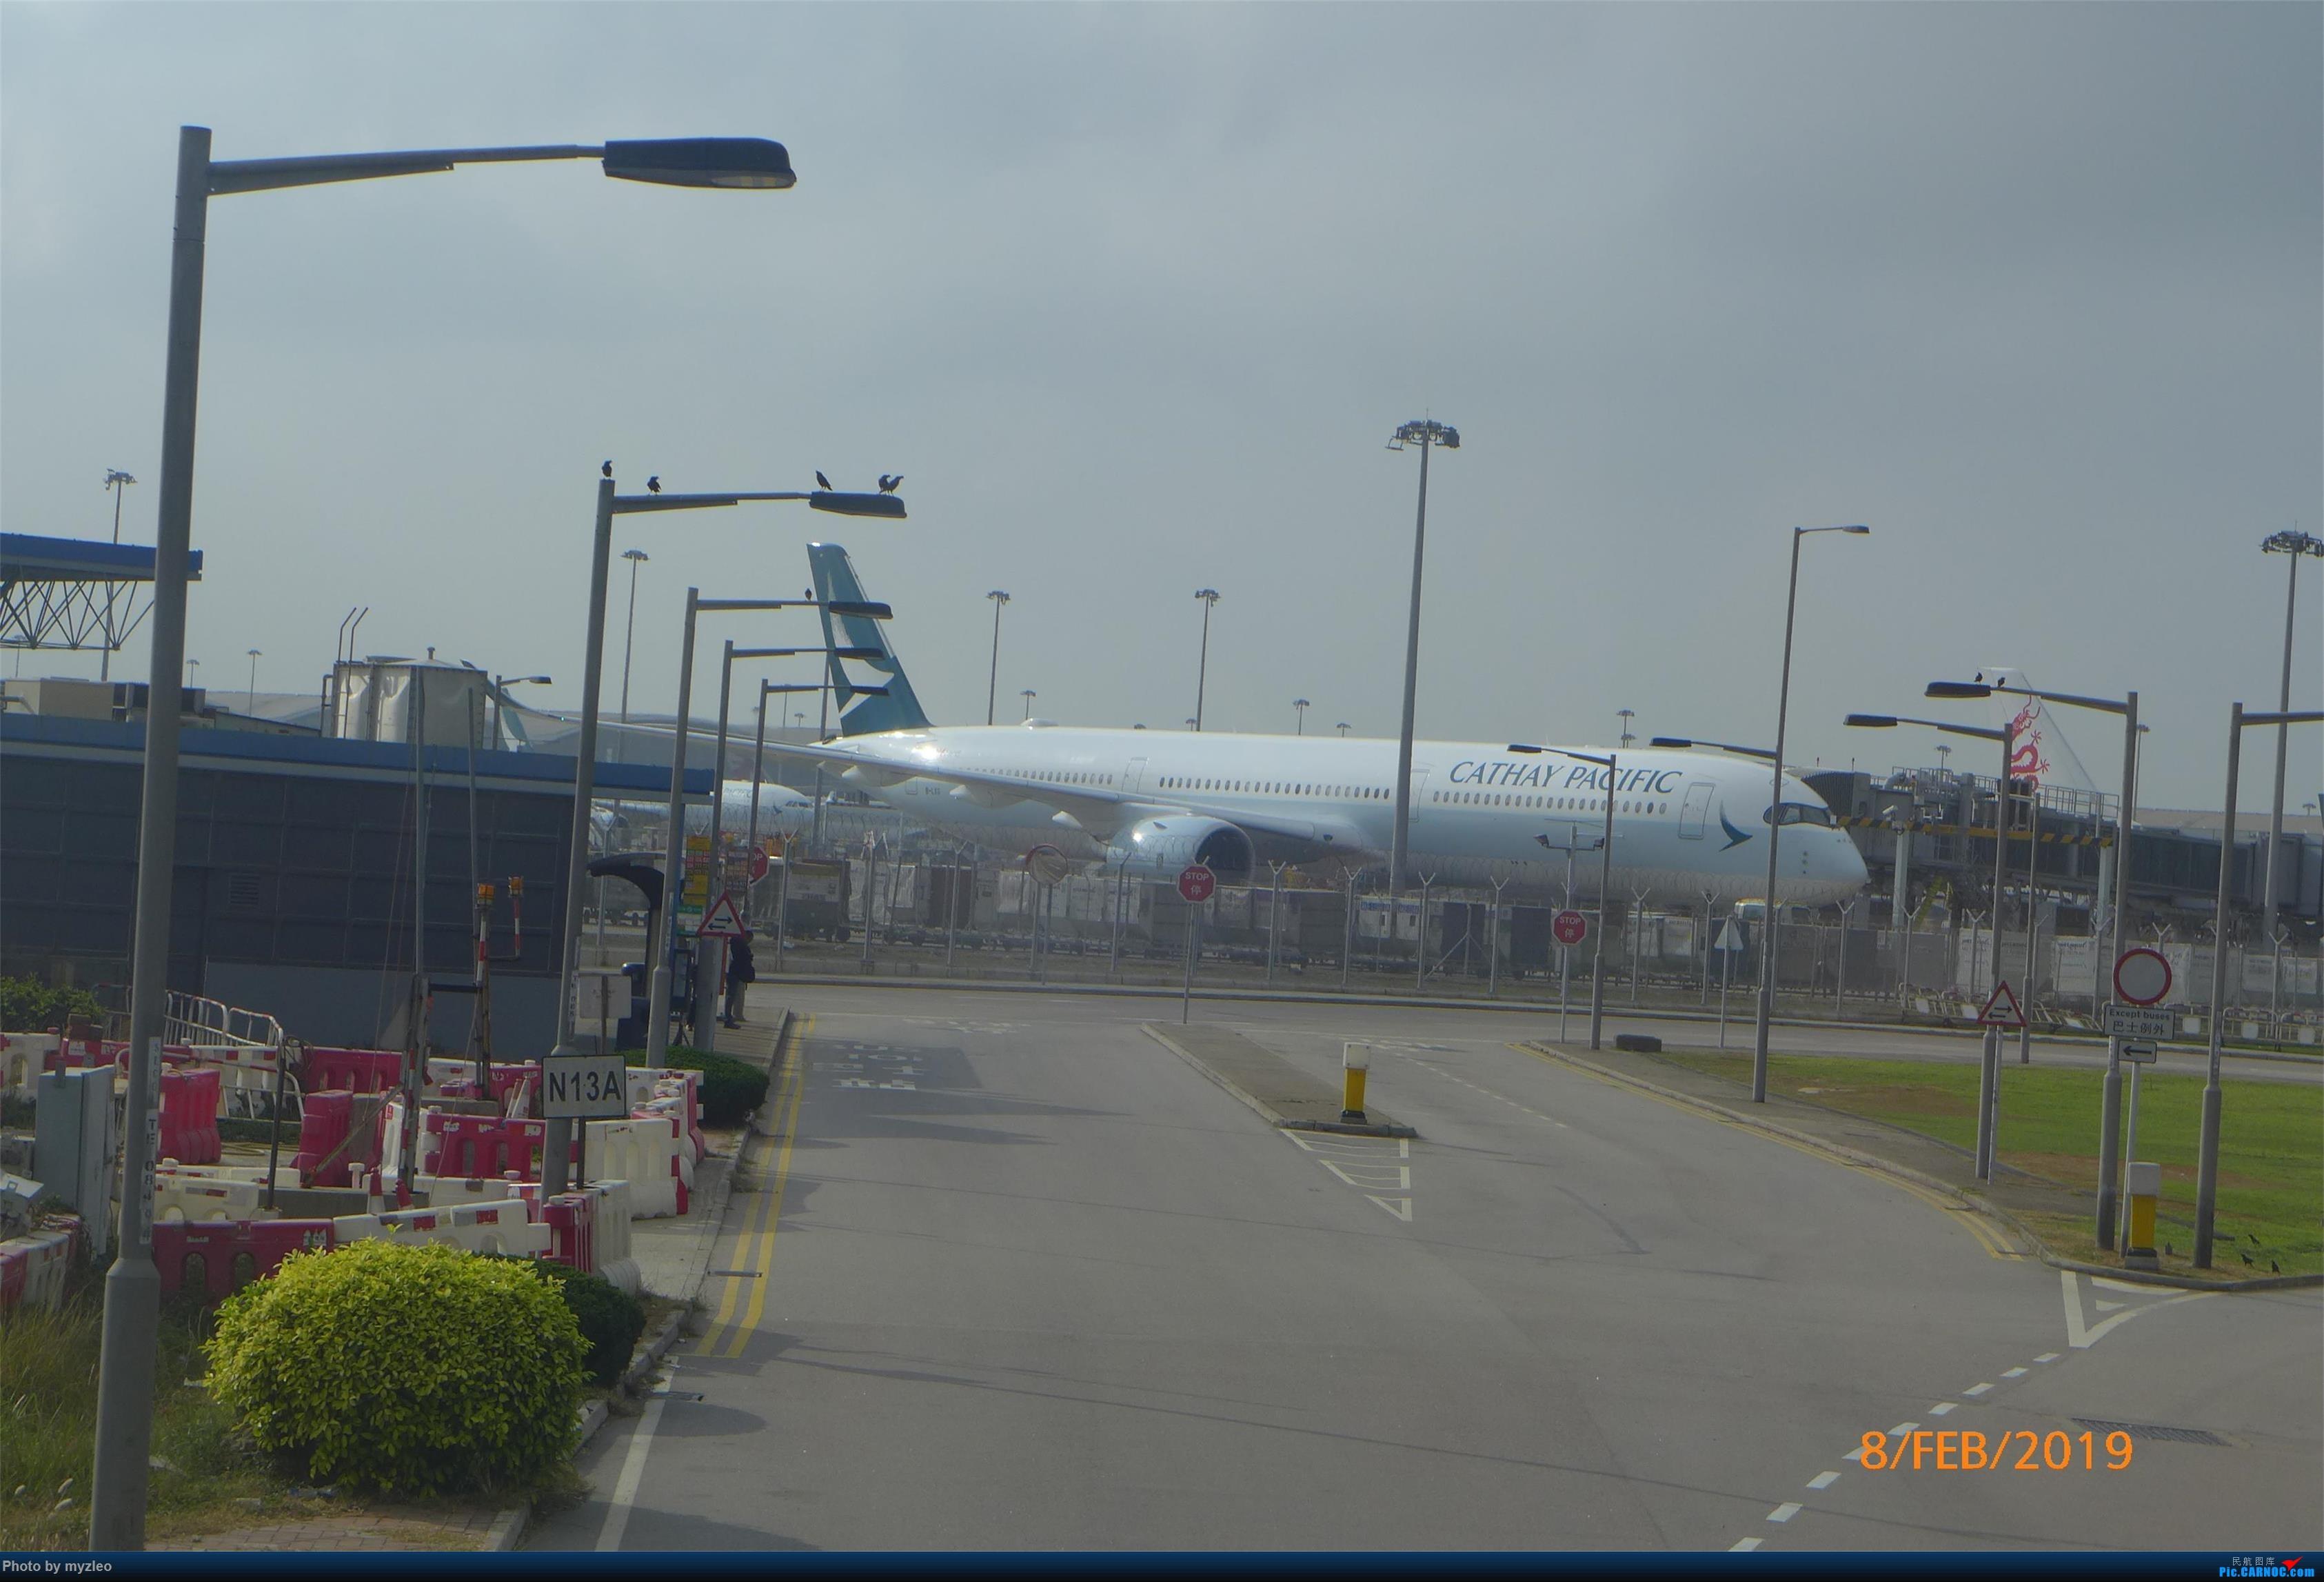 Re:[原创]【myzleo的游记4.5】十年之约(5)在香港的最后一天,搭乘港航333回沪 AIRBUS 350-1000 B-LXG 中国香港国际机场